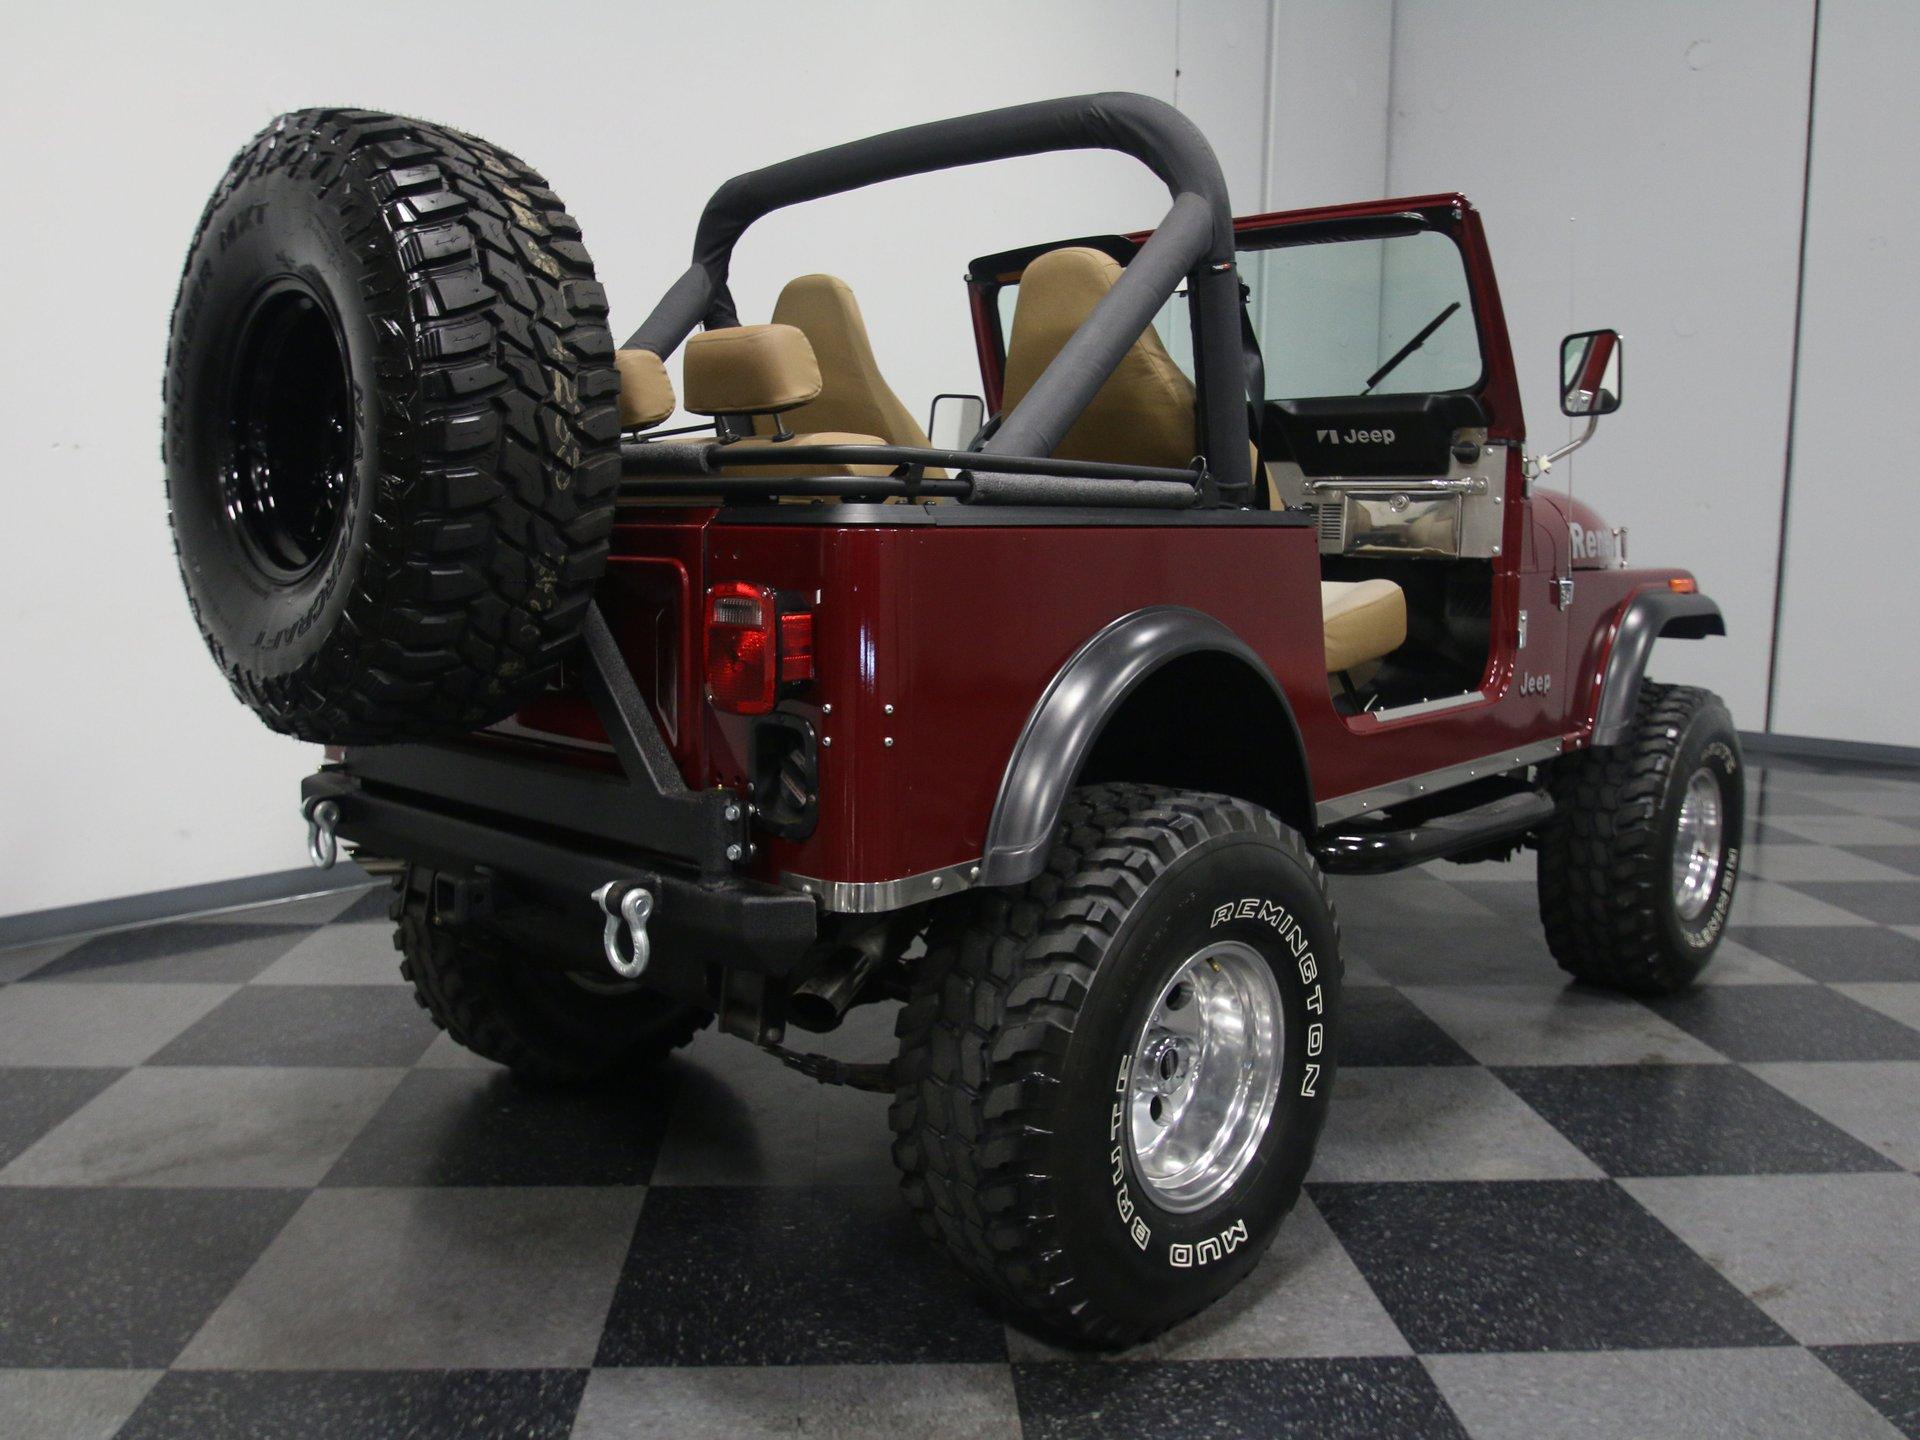 1982 Jeep CJ7 | Streetside Classics - The Nation's Trusted